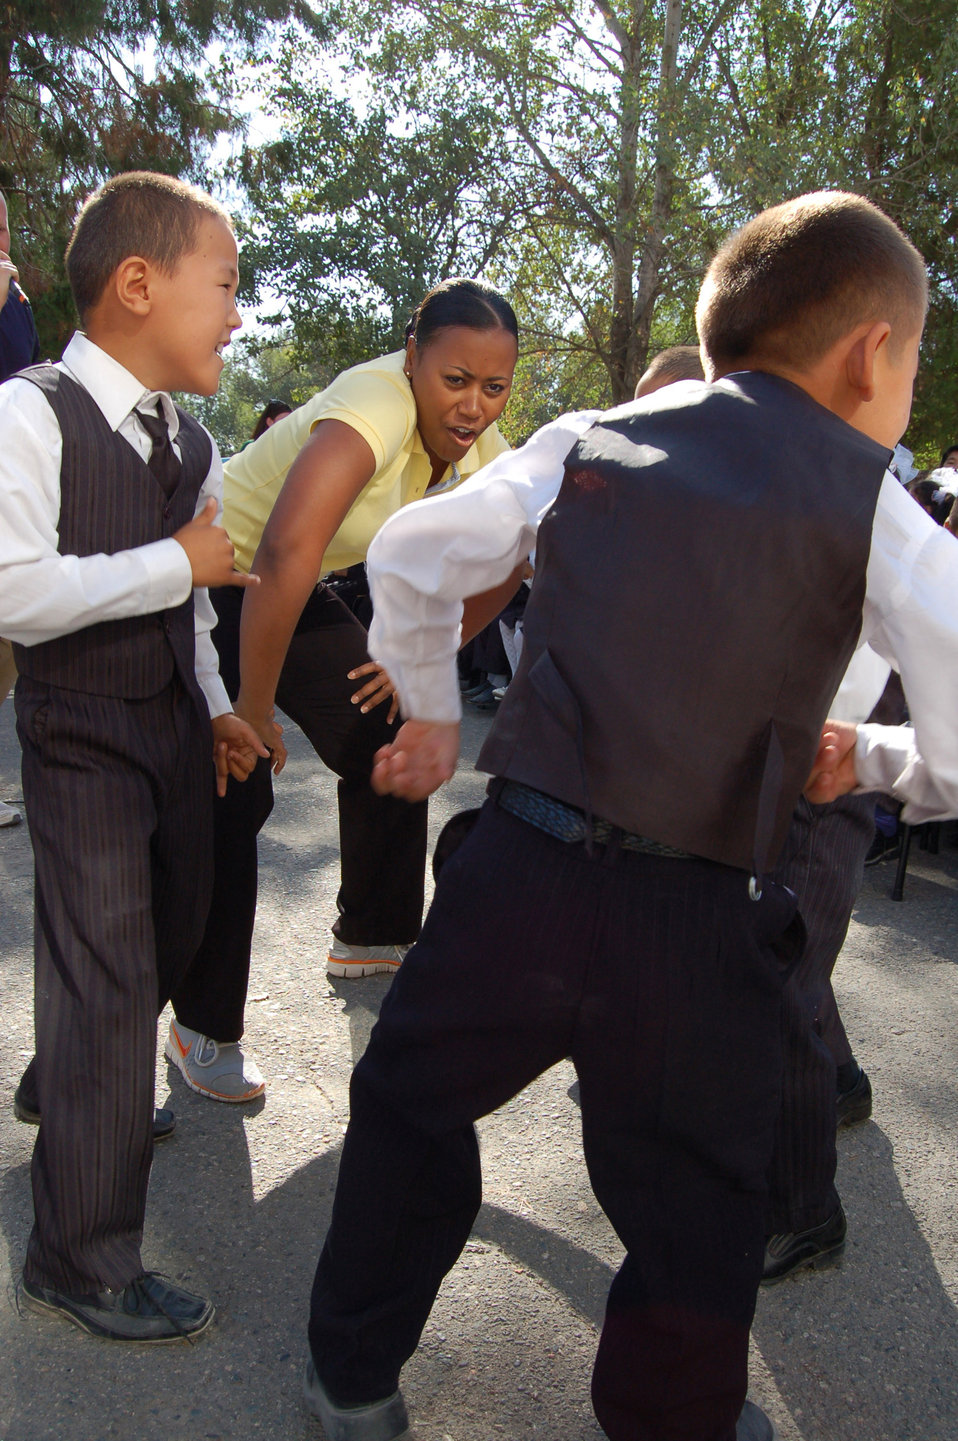 Band members, Kyrgyz citizens share culture through music